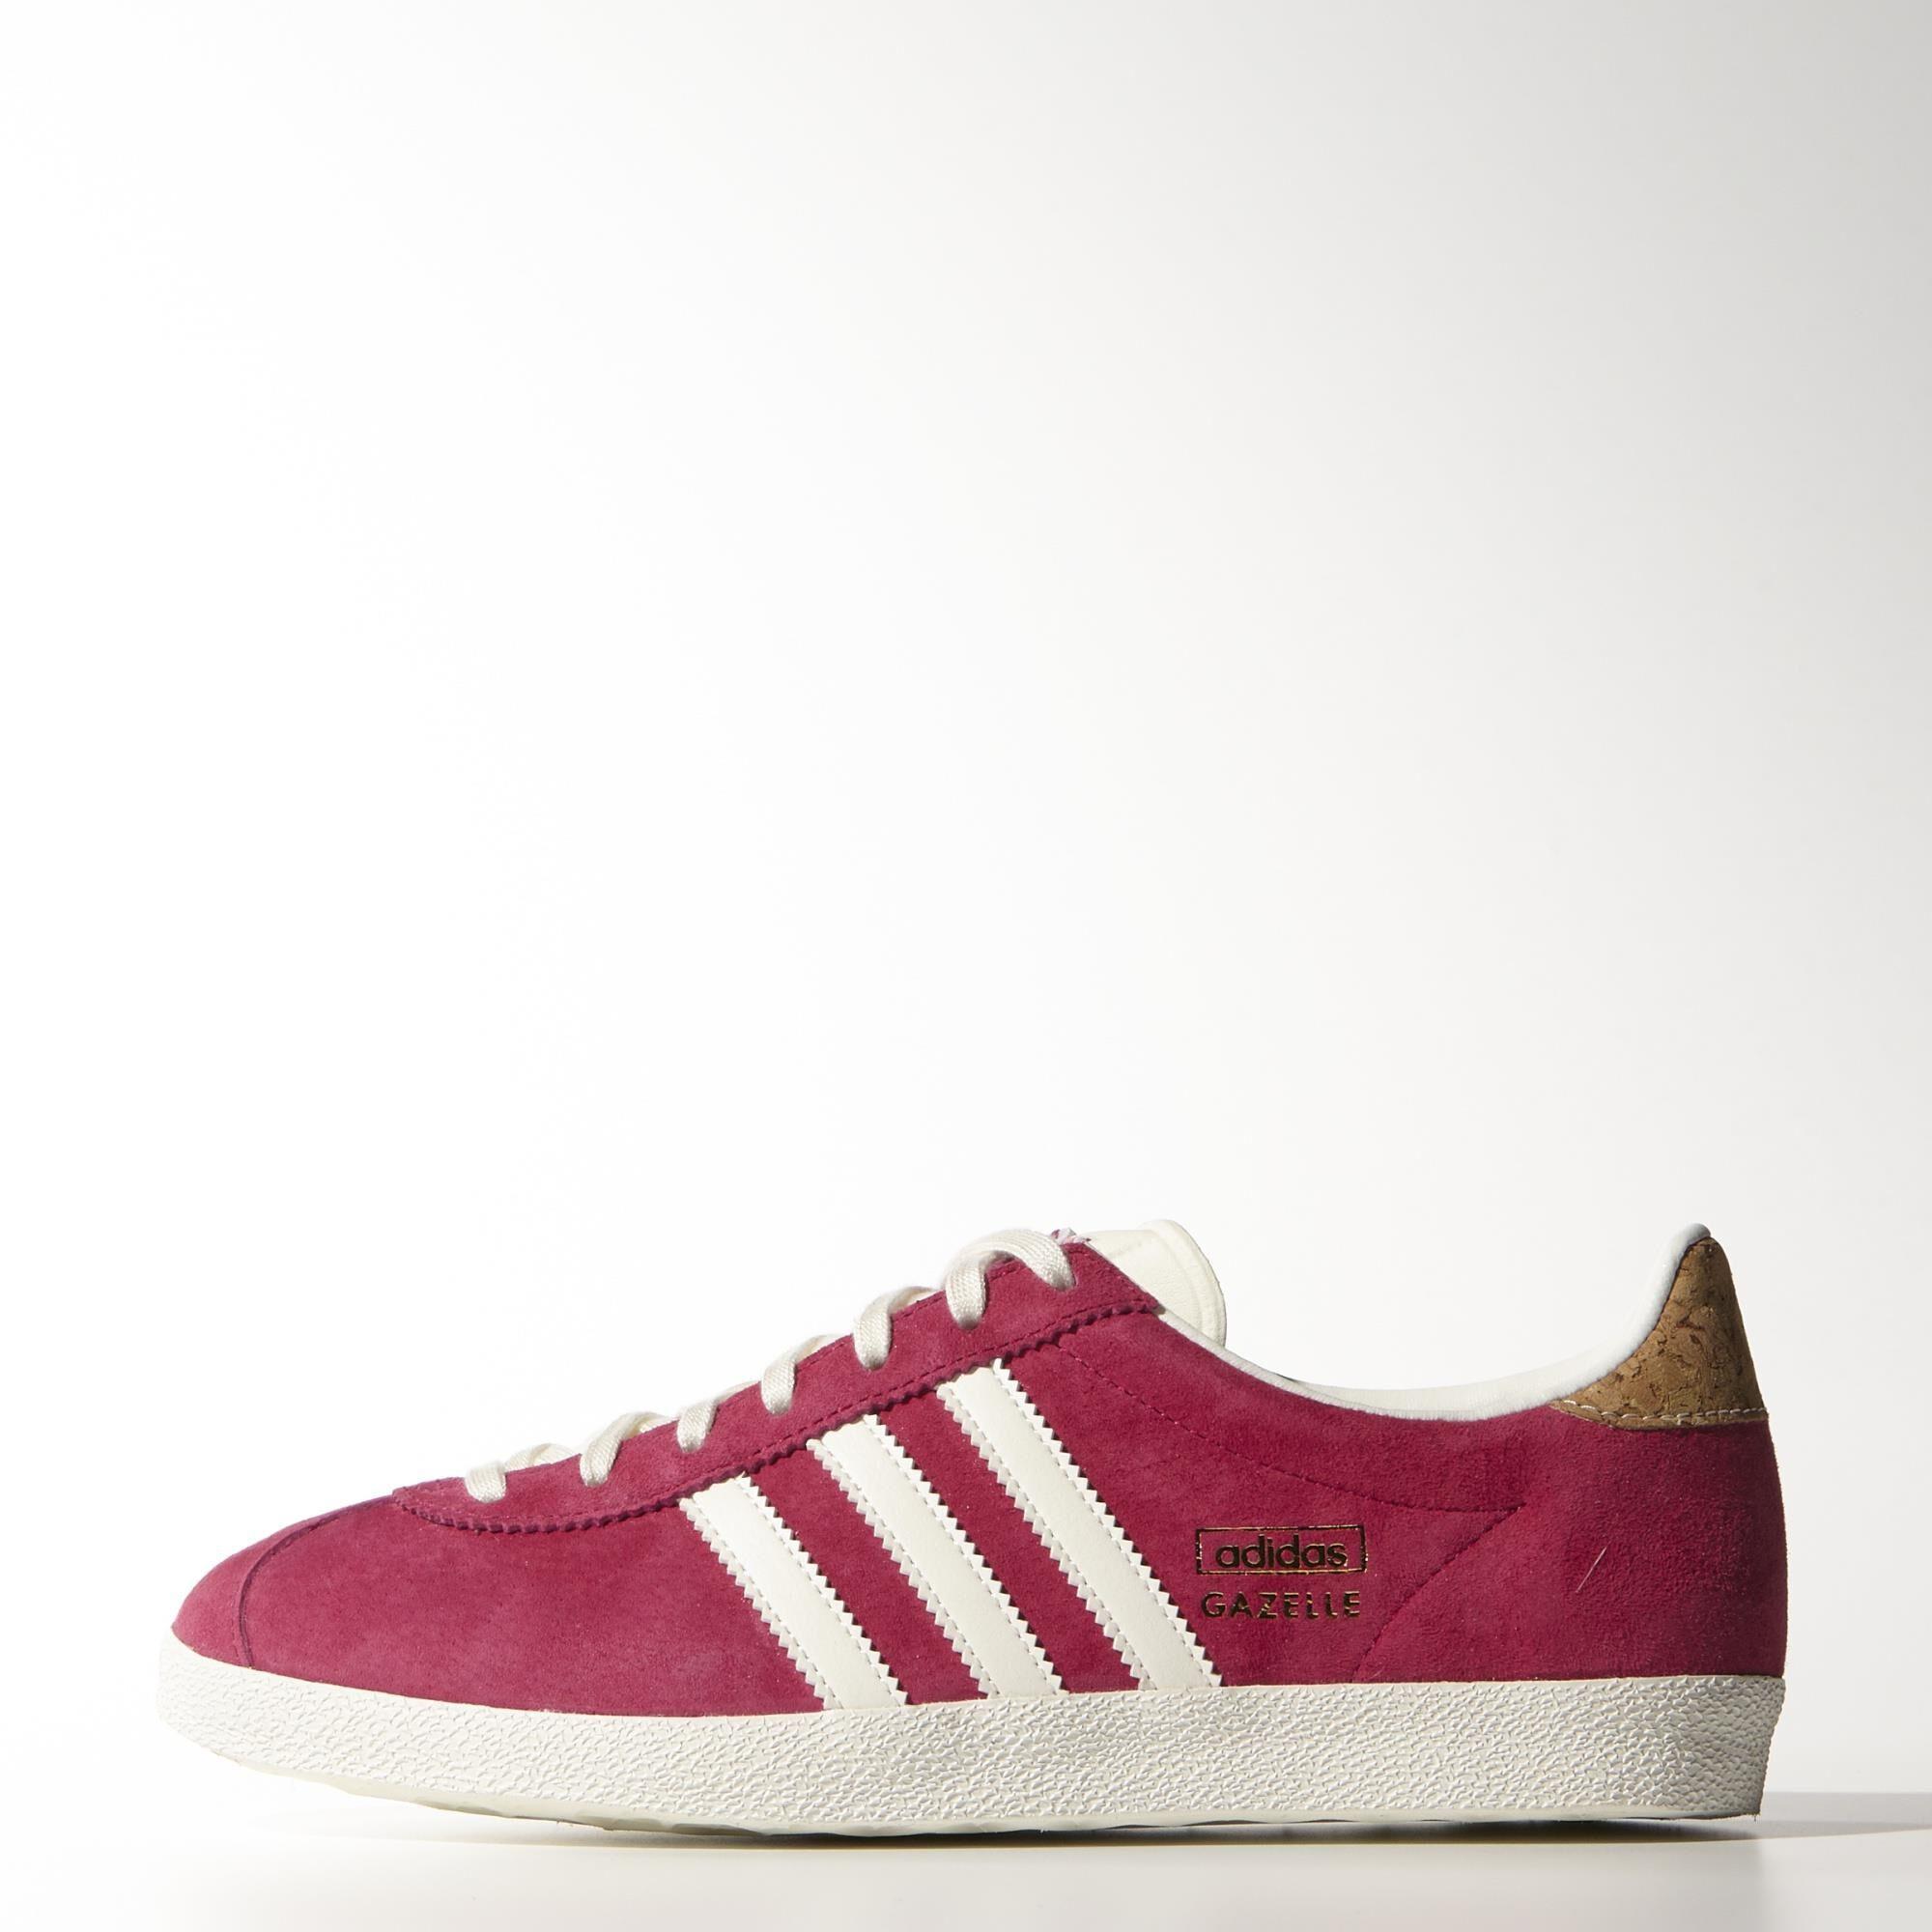 adidas gazelle rosas 35